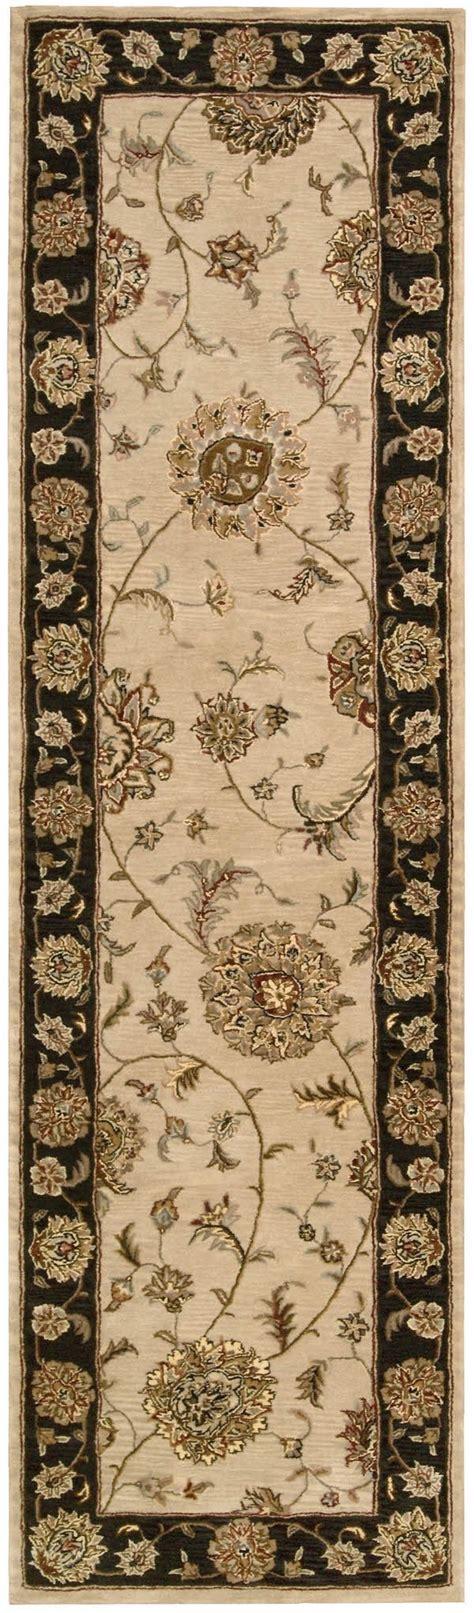 rugs nz new zealand wool pebble area rug by harta designs rug designs